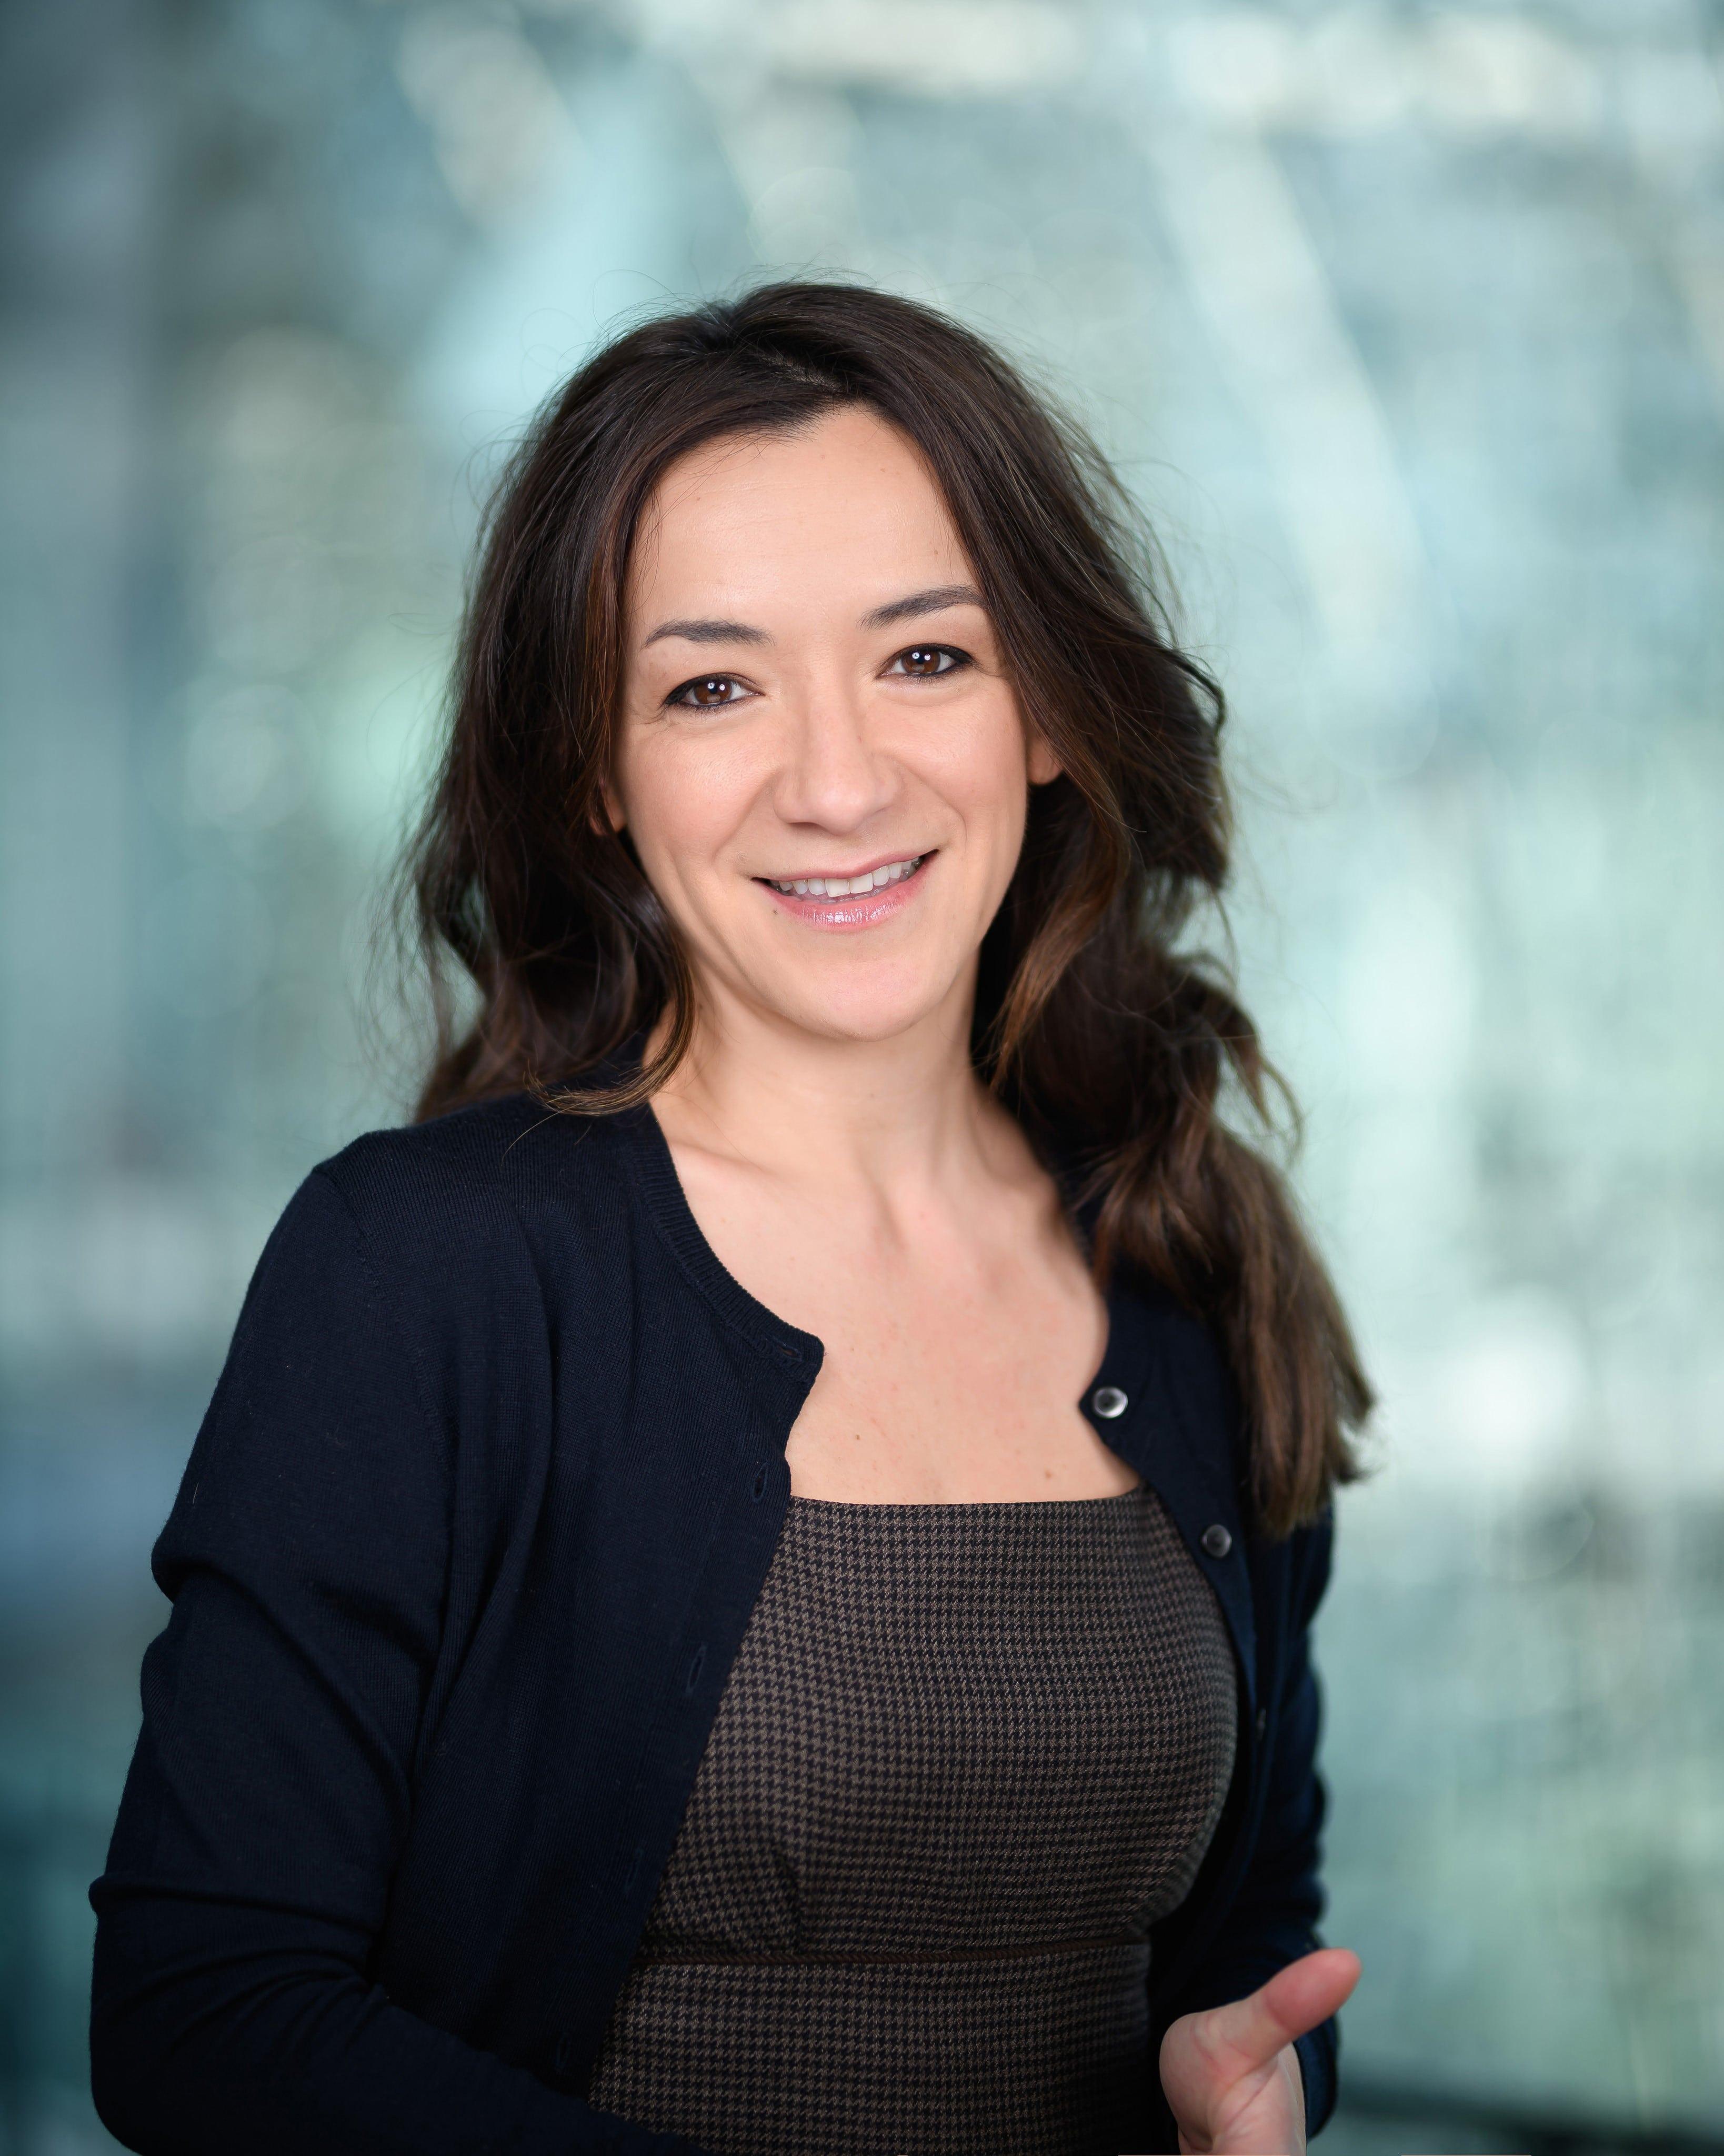 Isabelle Leung-Tack